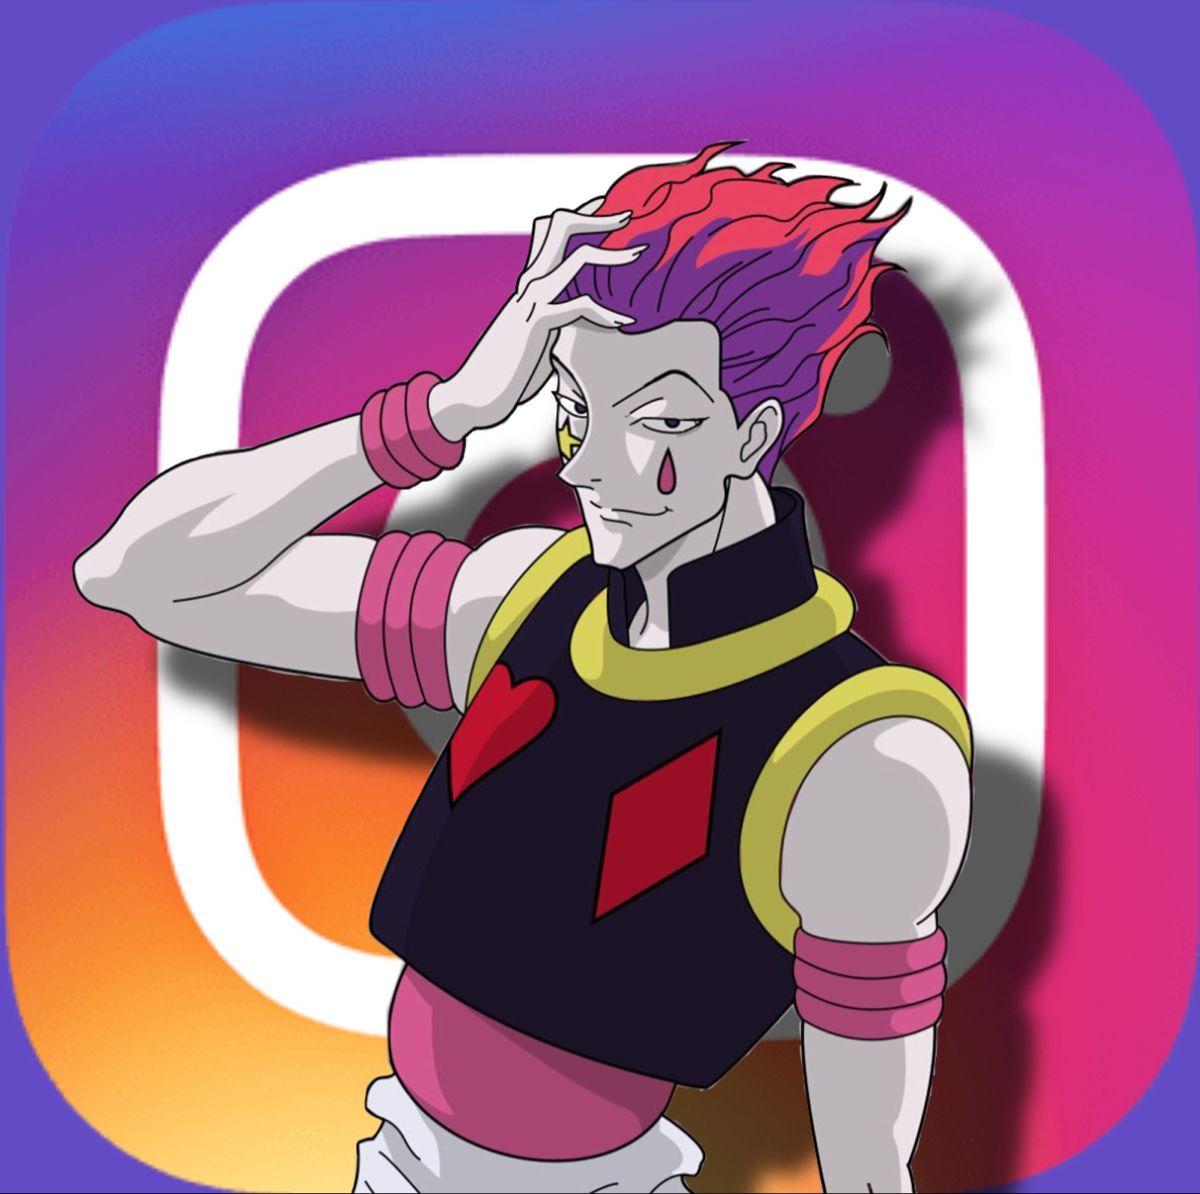 Hisoka app icon in 2020 App icon, Animated icons, Mobile